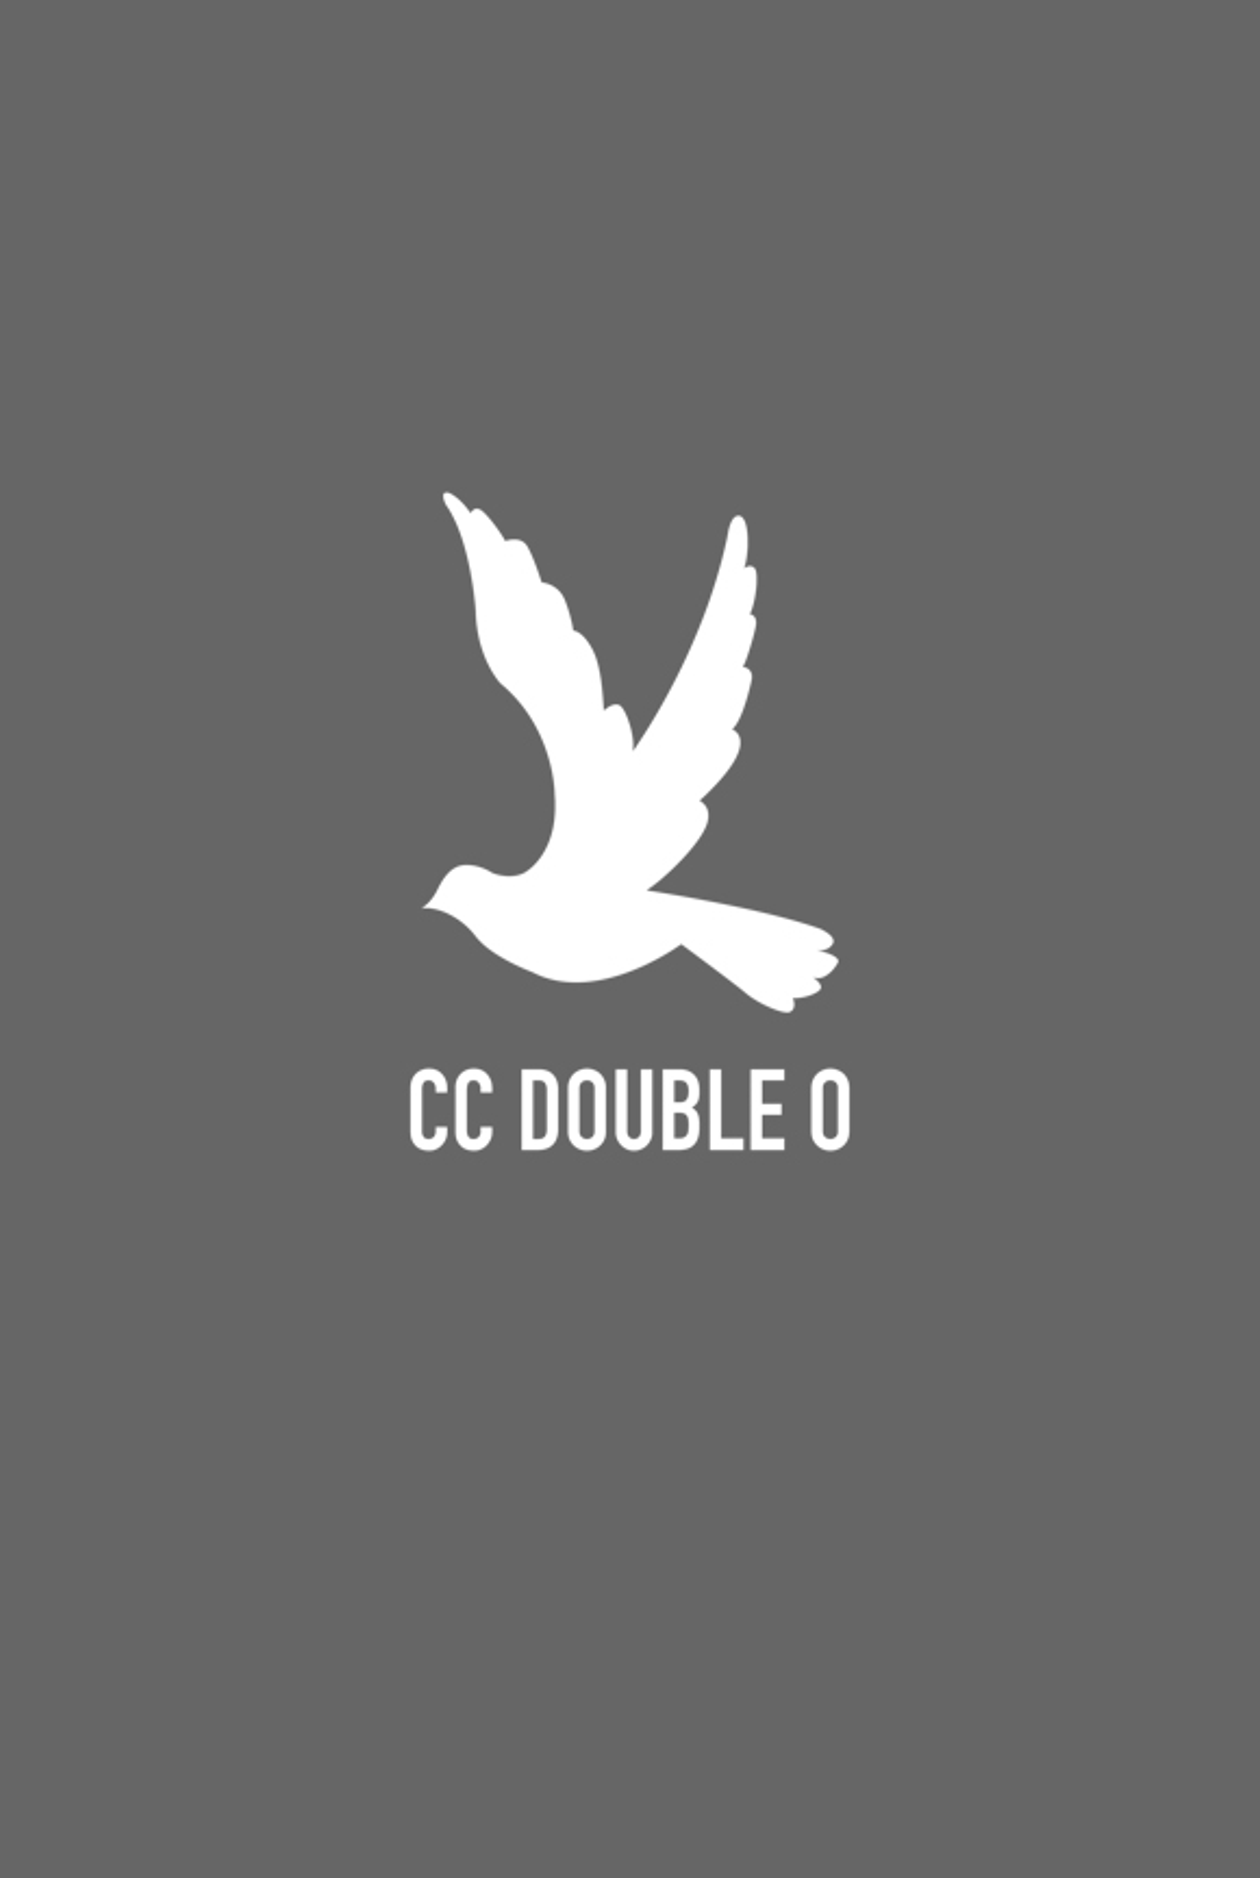 CC DOUBLE O BADGE HOLDER